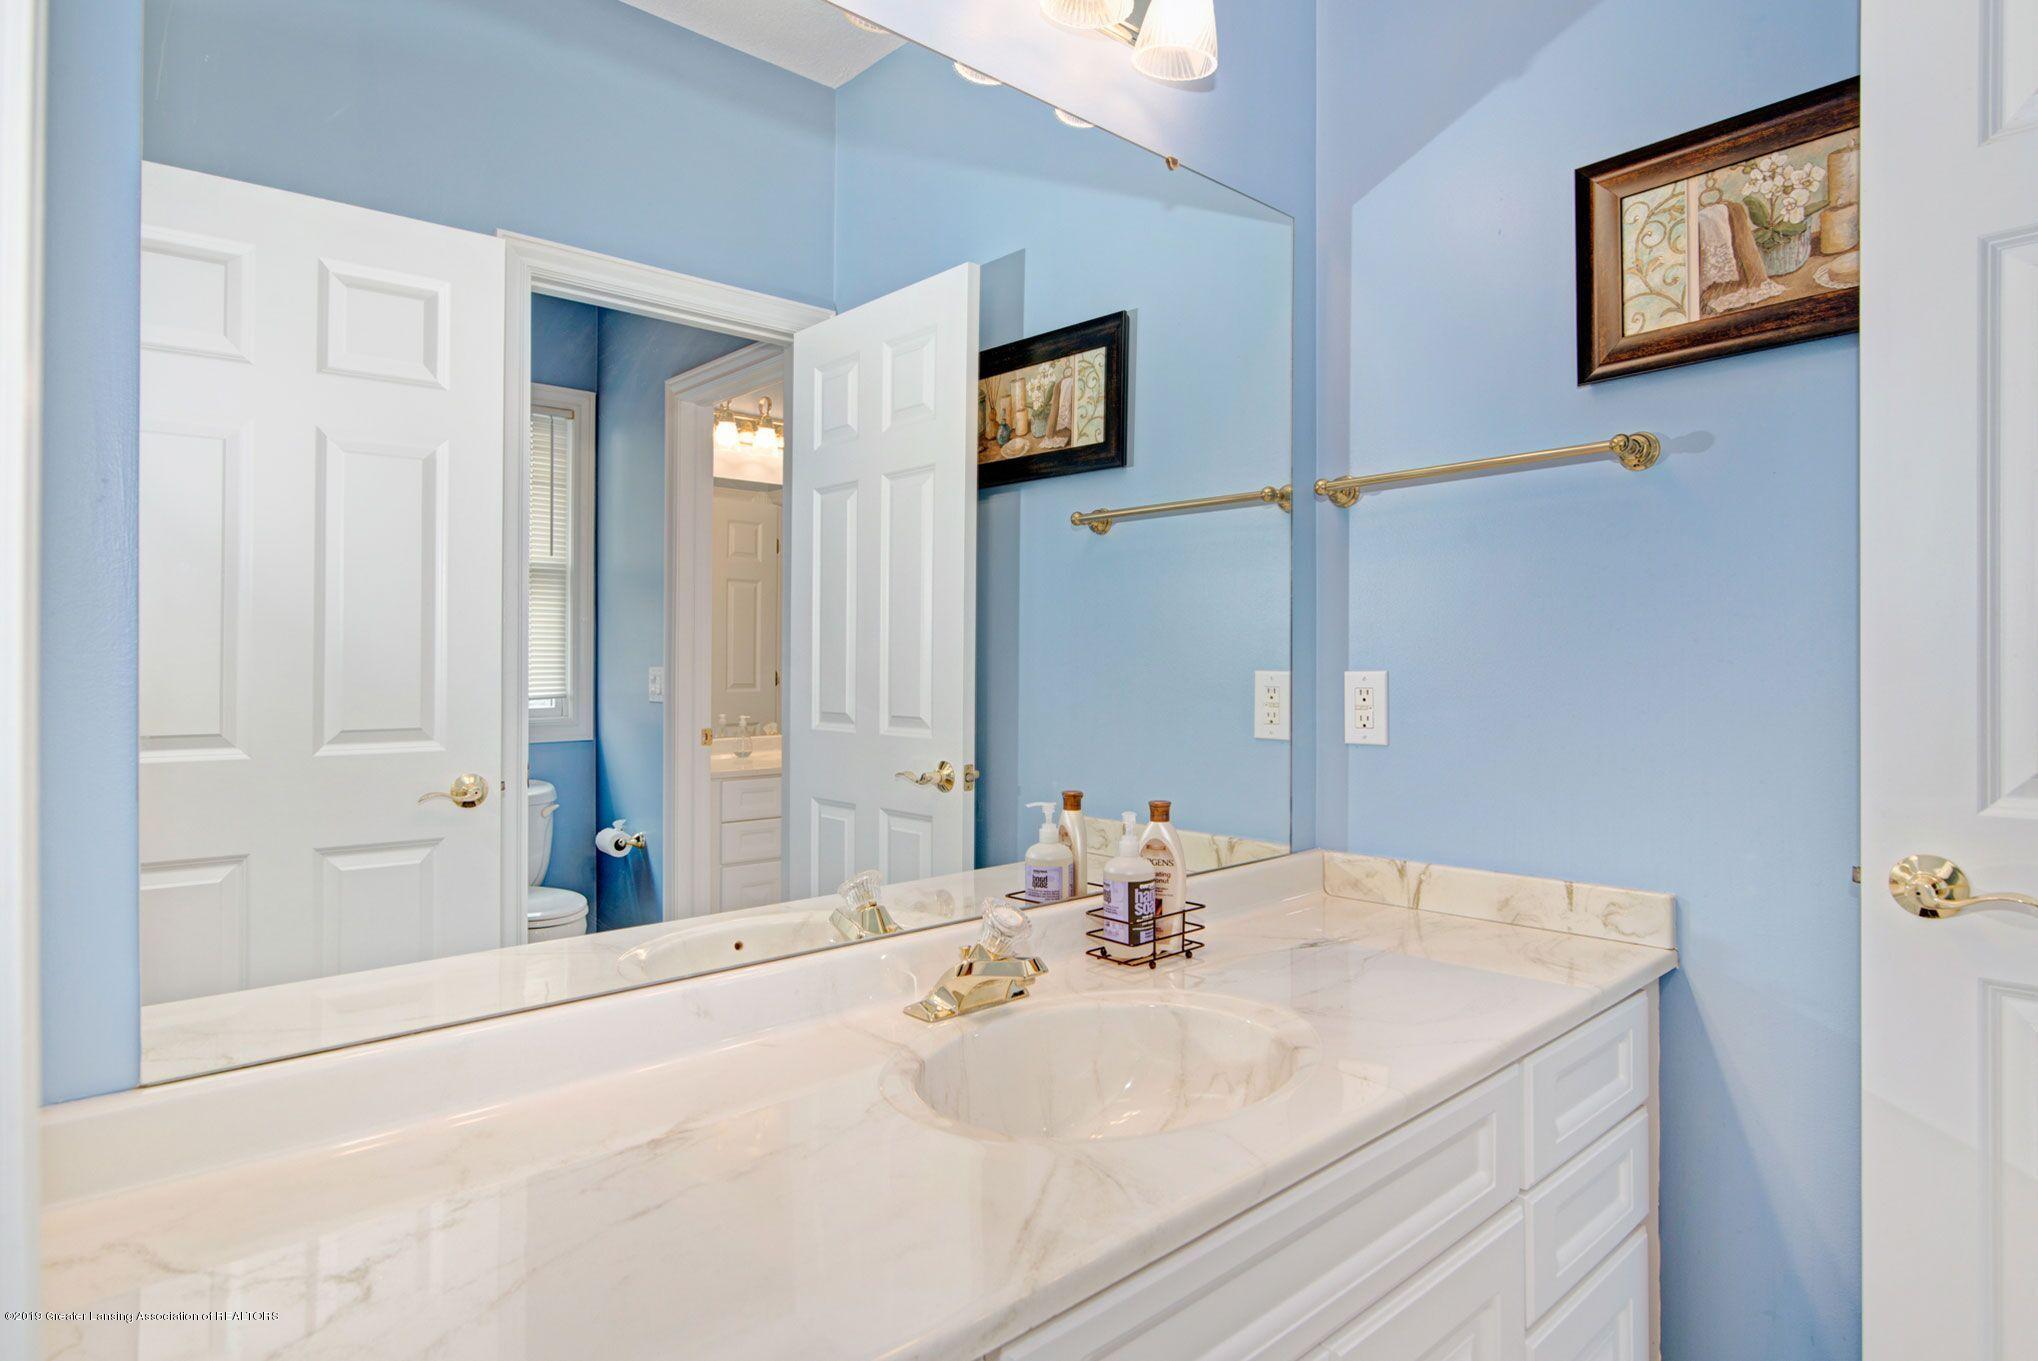 6389 Ridgepond Dr - Bathroom 2 1 - 33